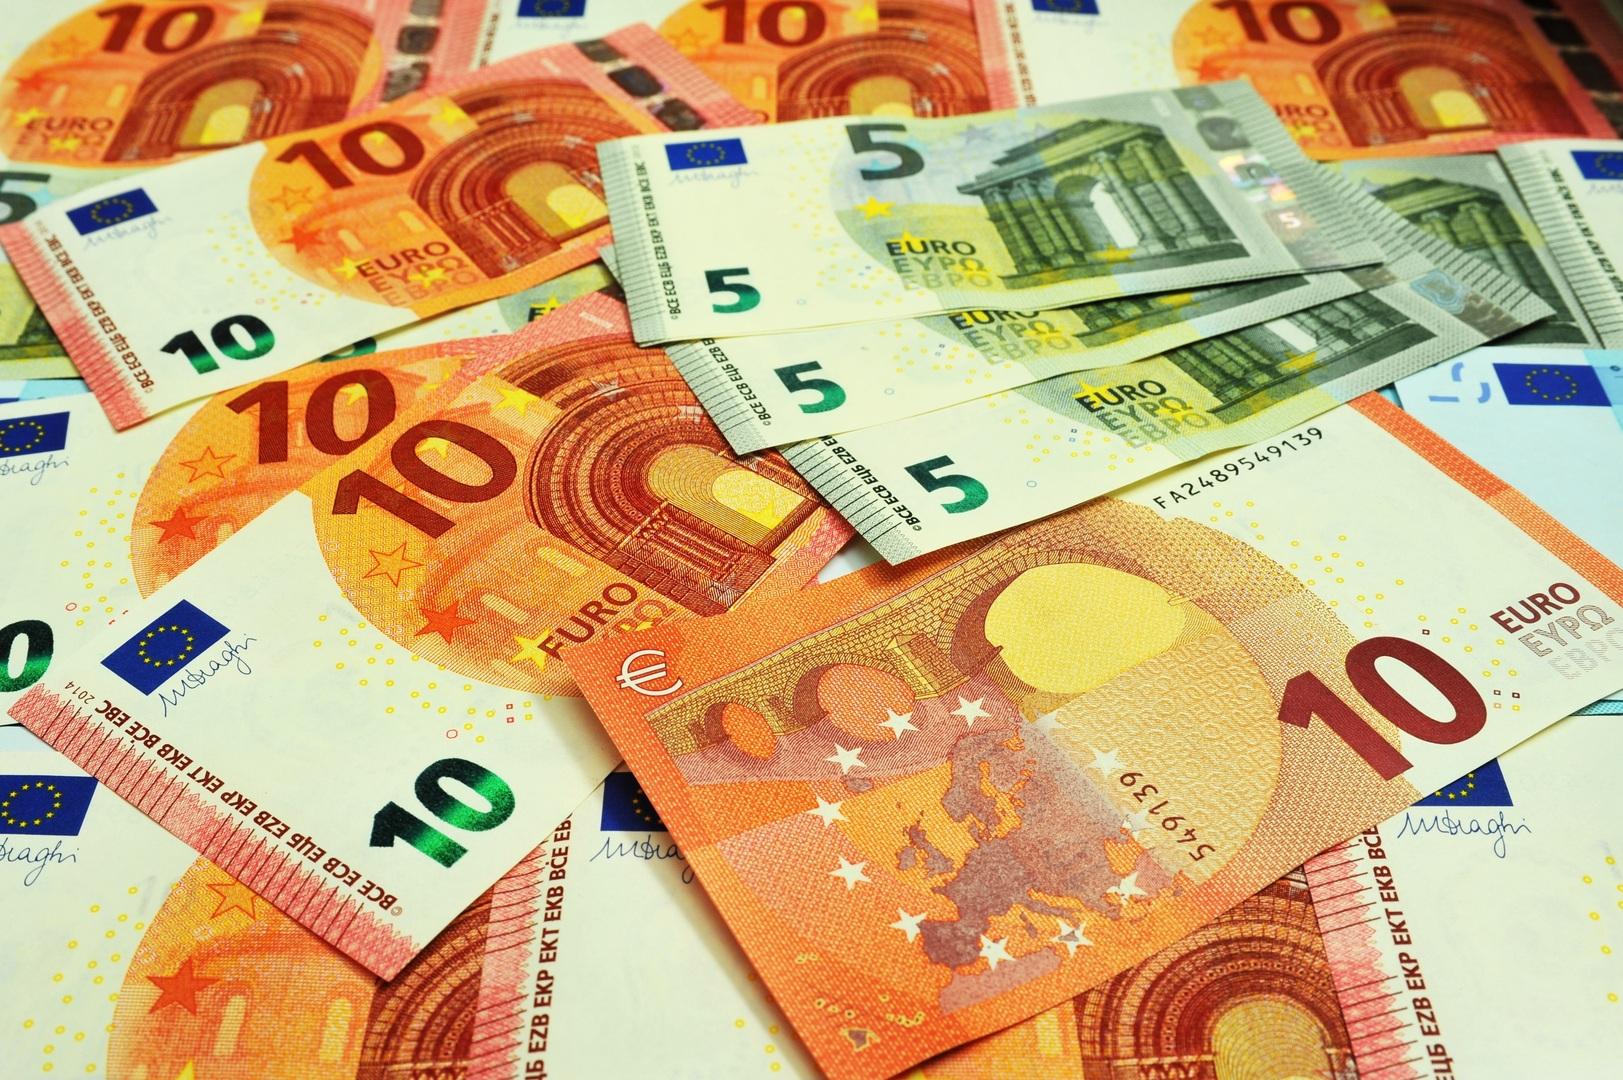 Картинки евро рубли доллары